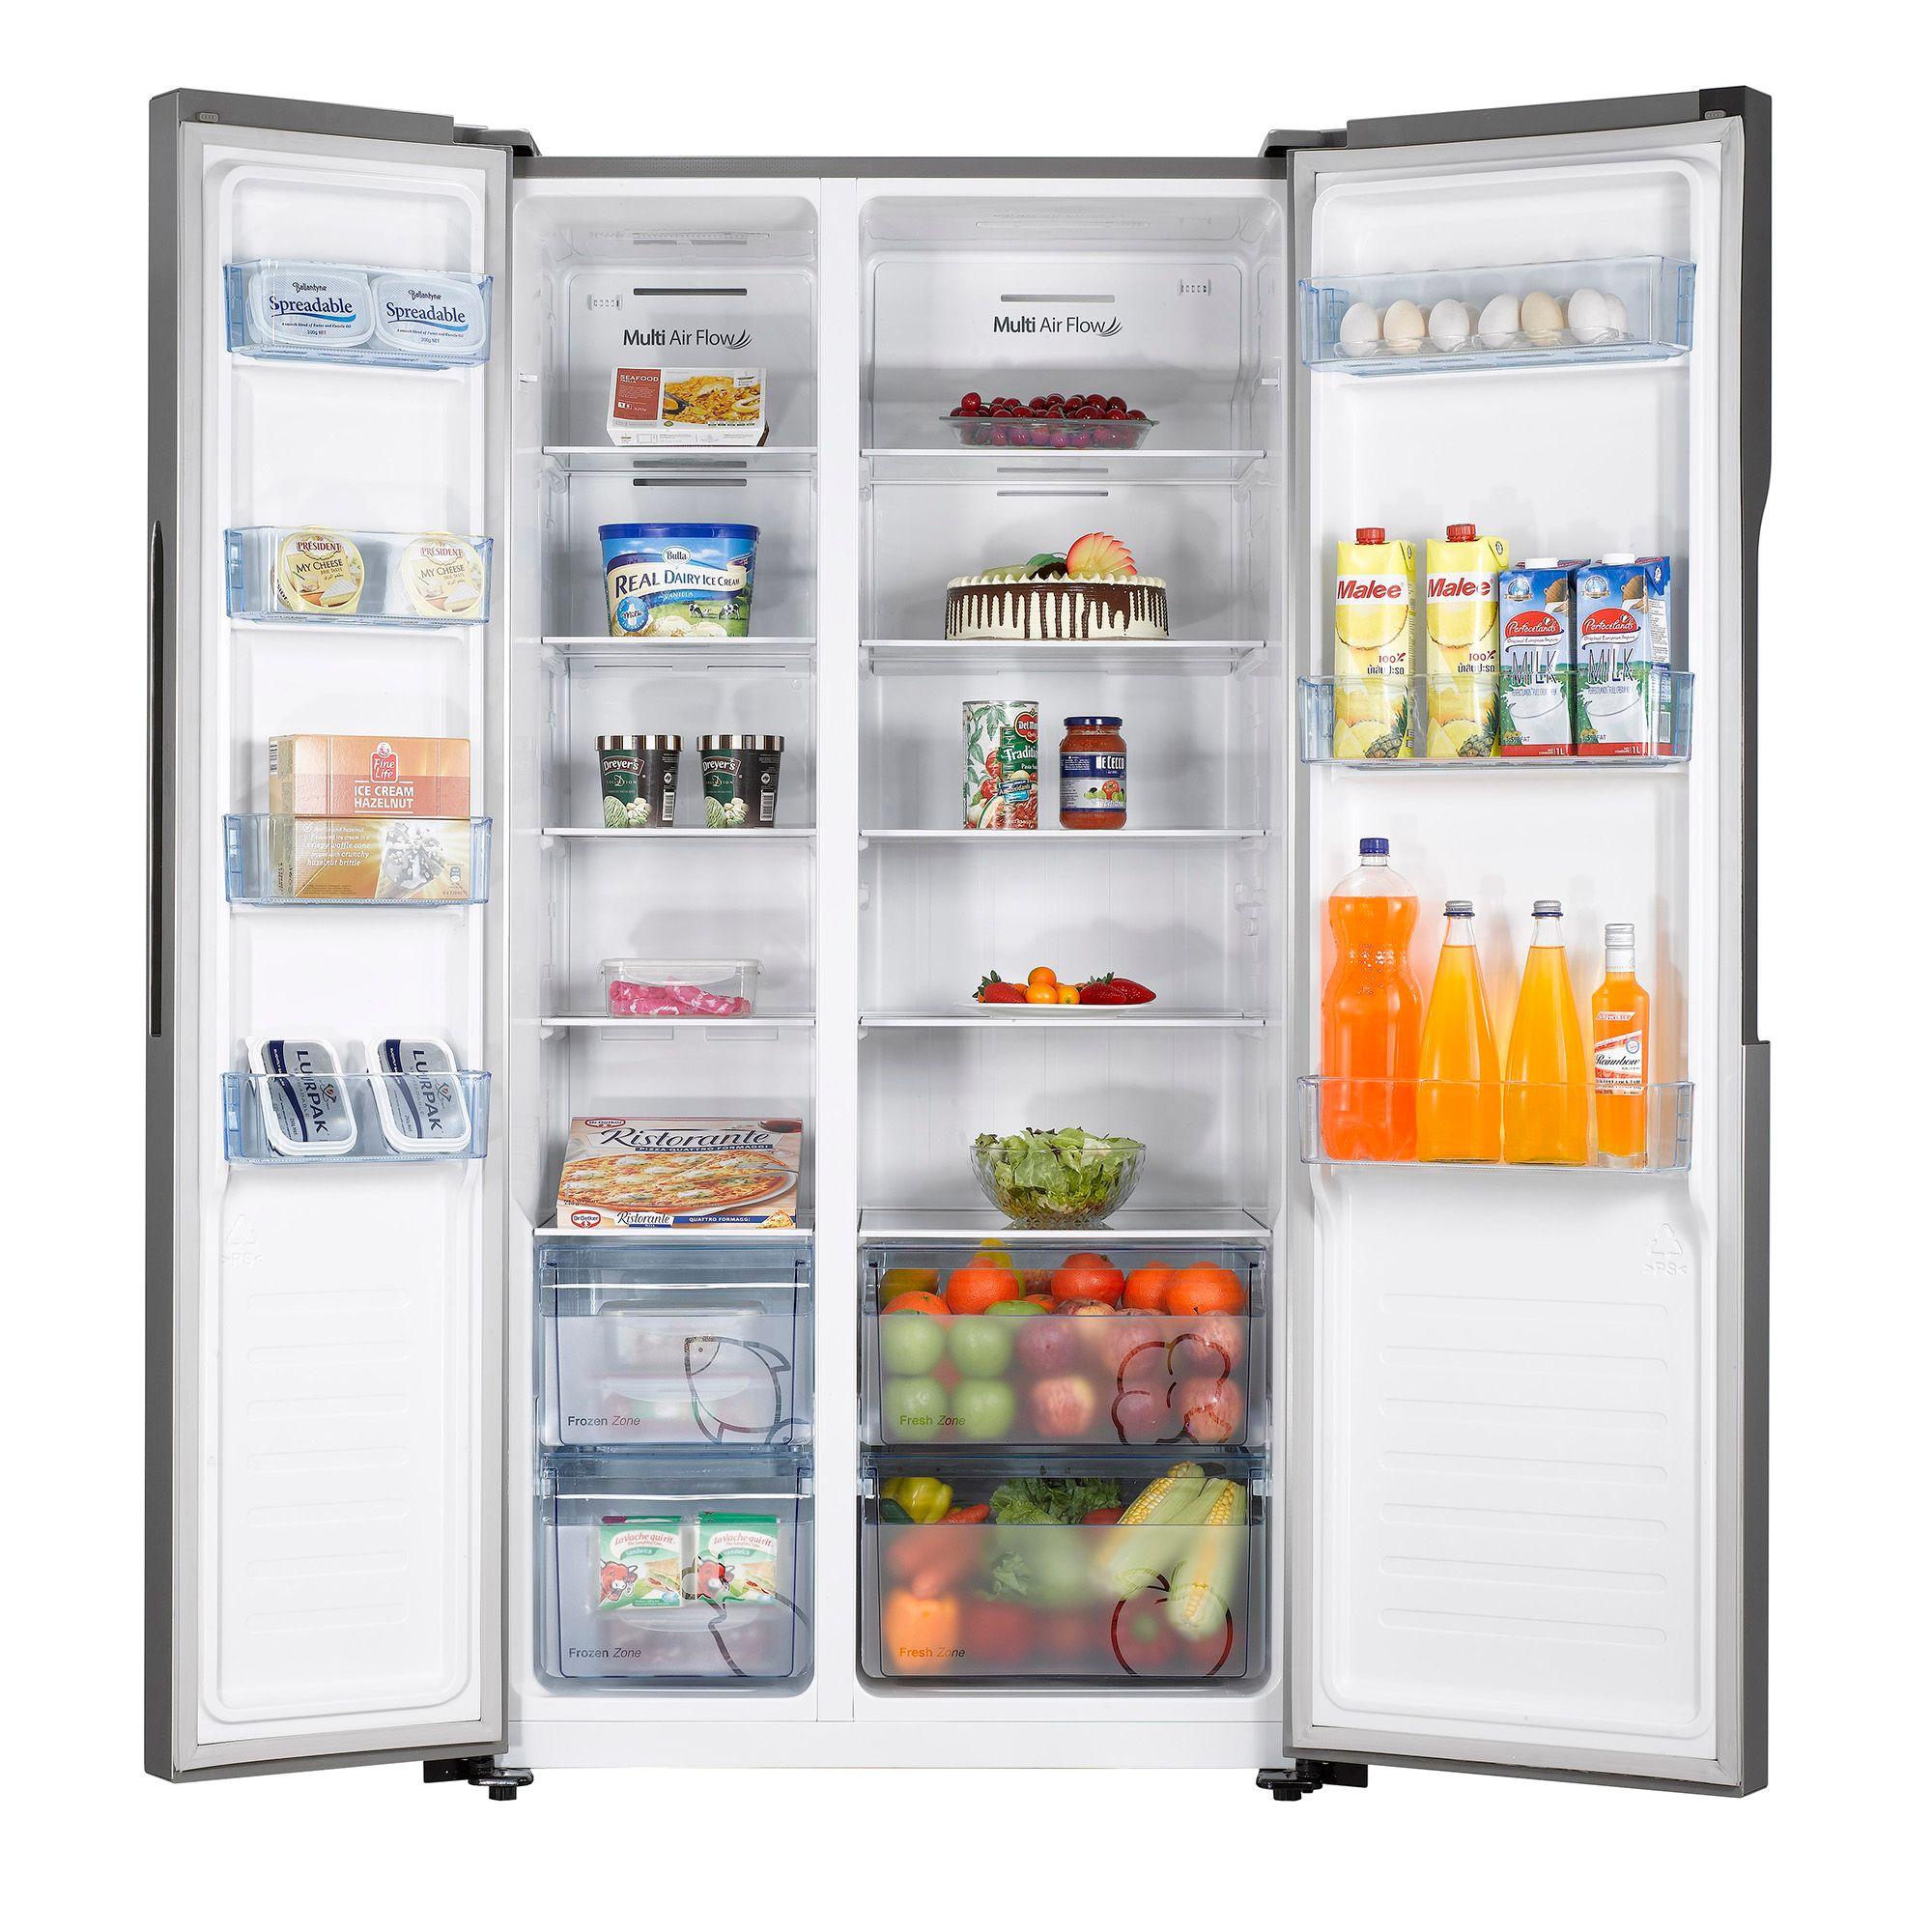 Хайнер топ хладилници